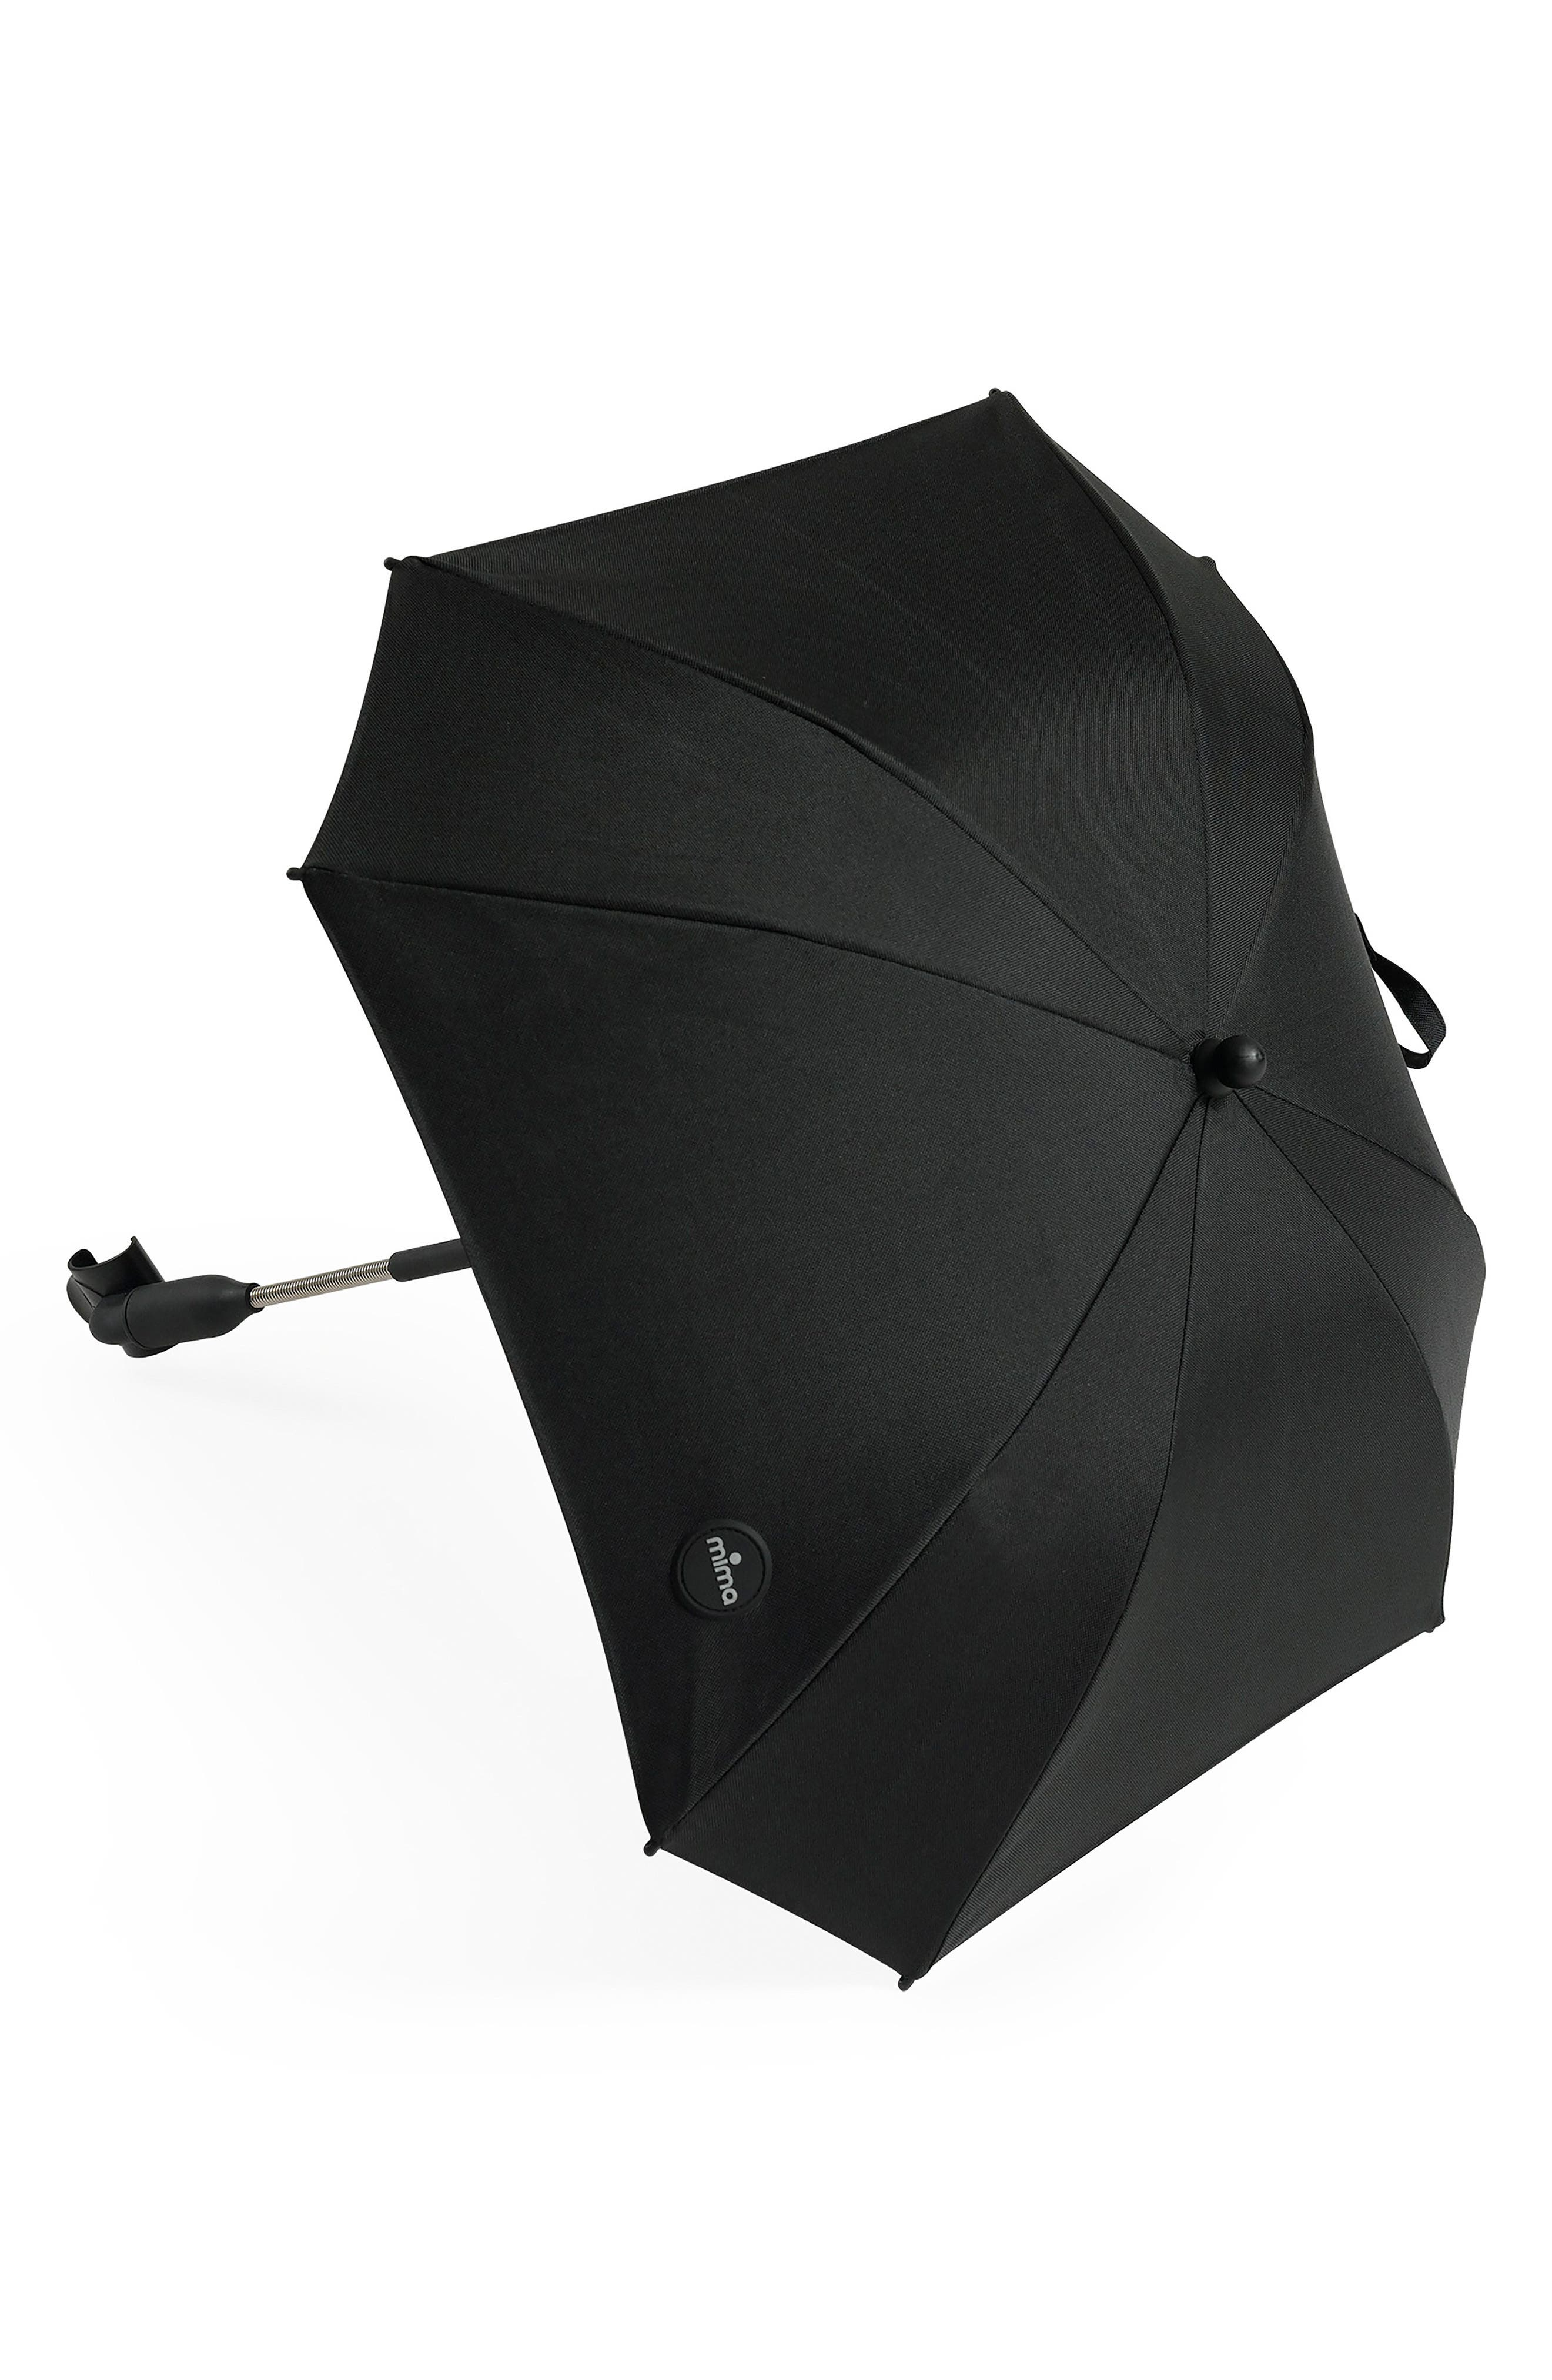 Stroller Umbrella,                             Main thumbnail 1, color,                             BLACK